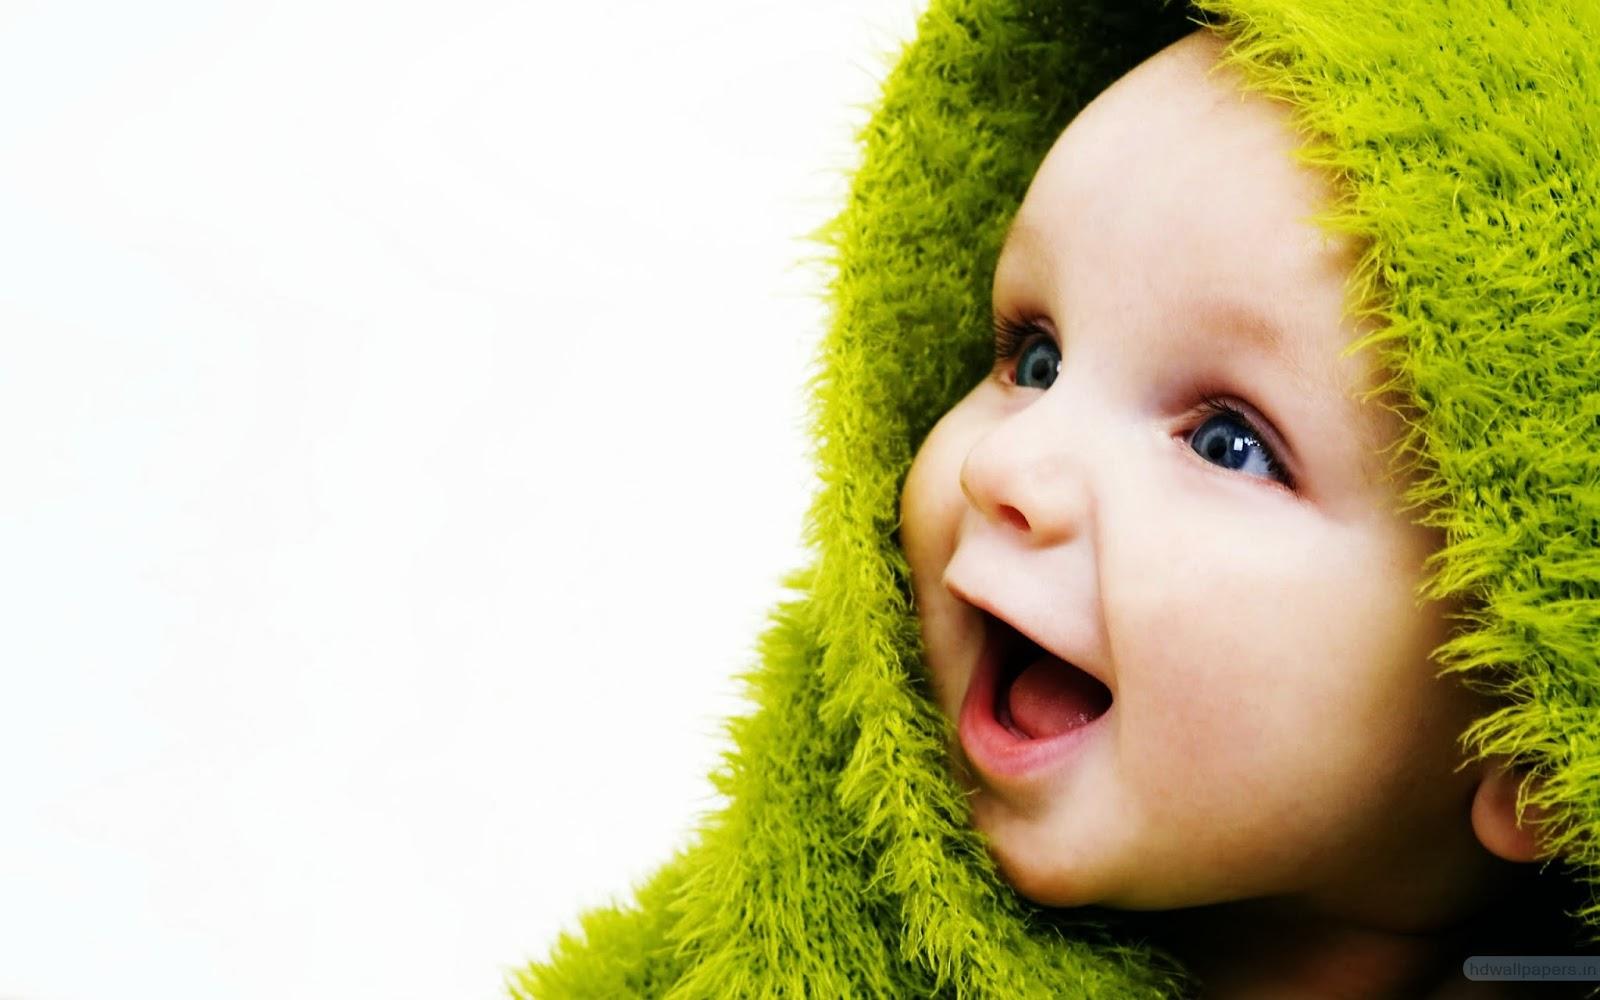 Cute Baby Wallpapers Hd Free Beautiful Desktop Wallpapers 2014